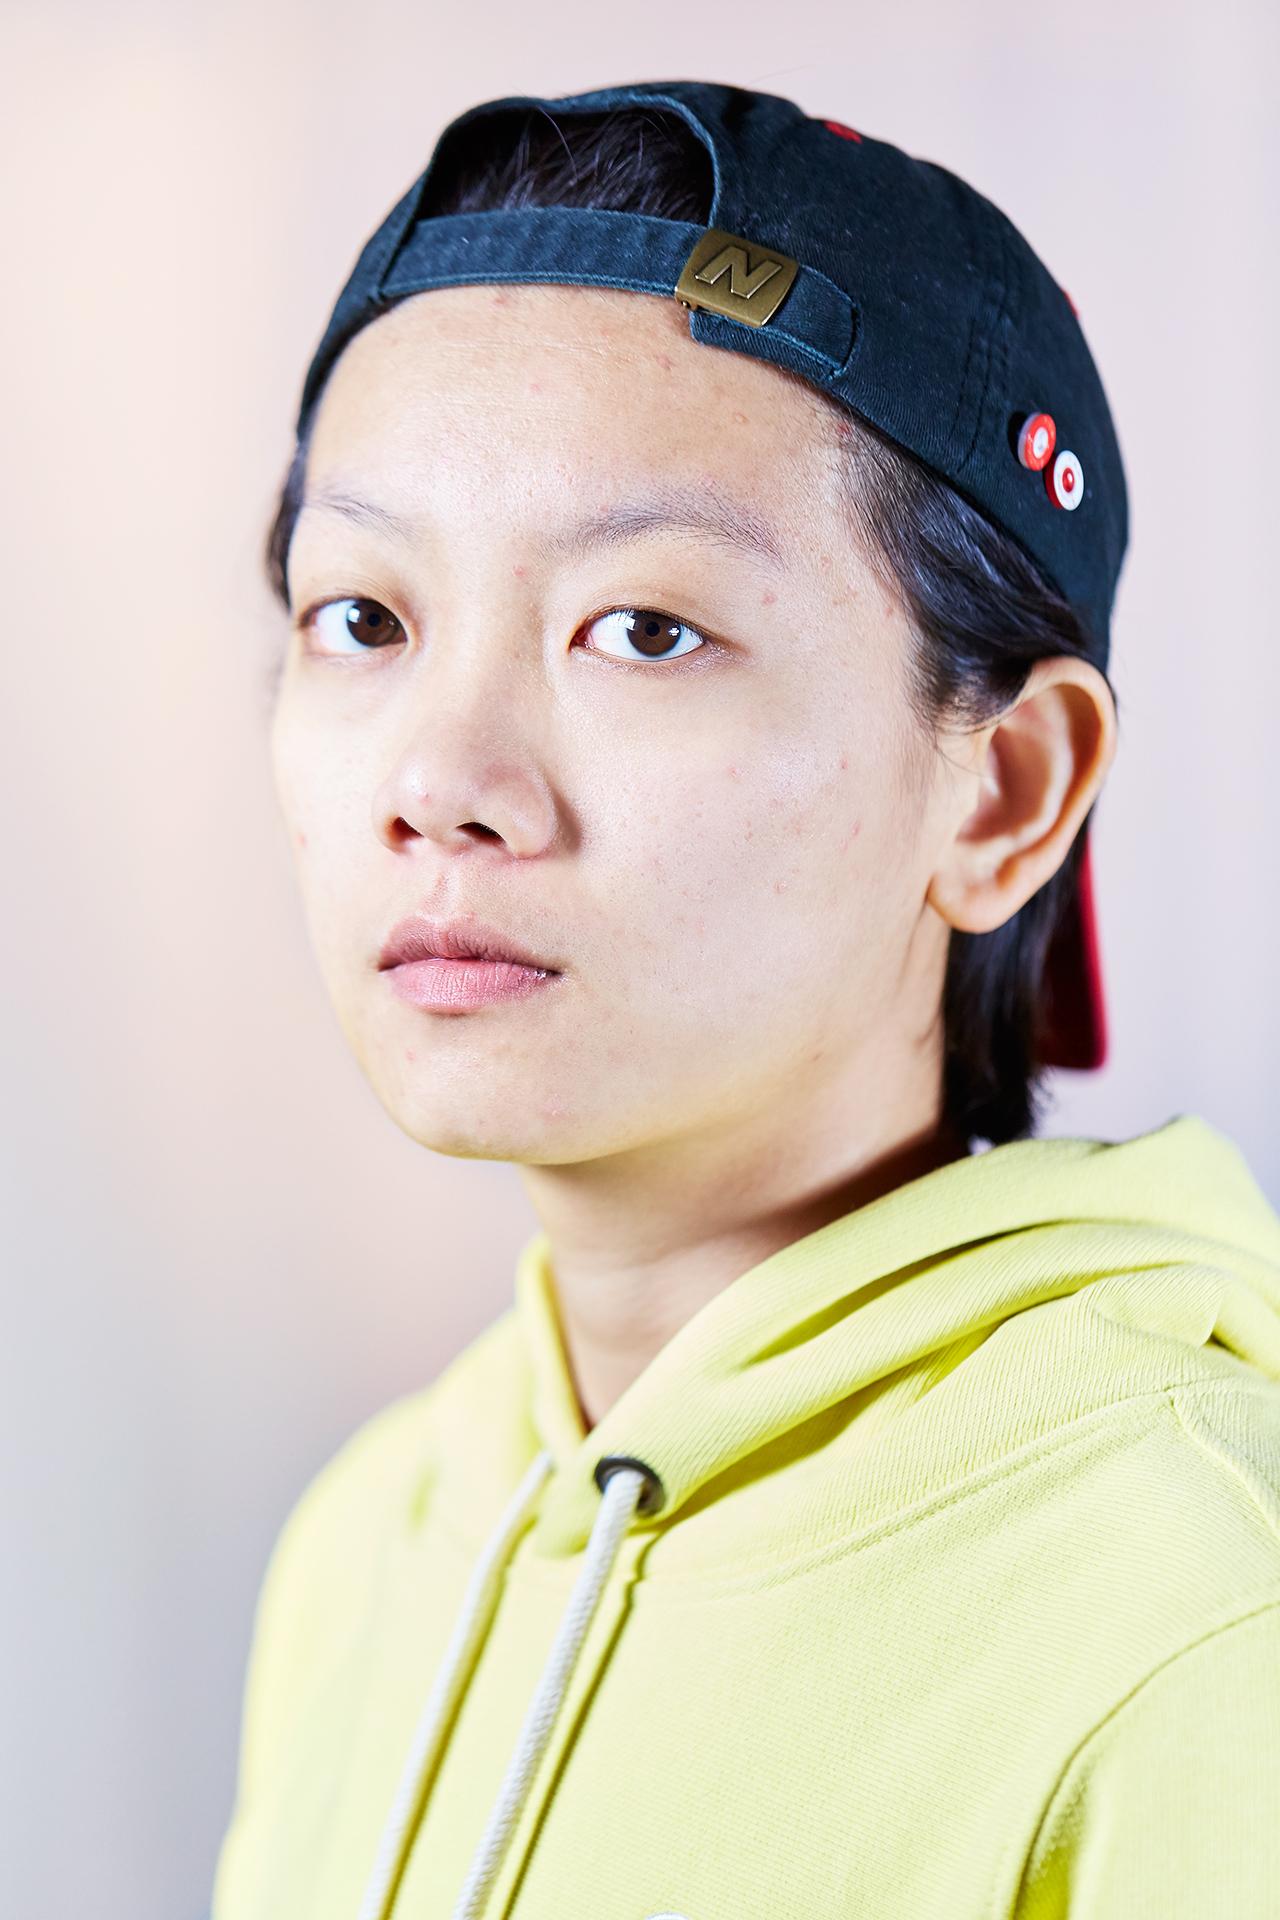 Chuhang Ma - Camera Operator